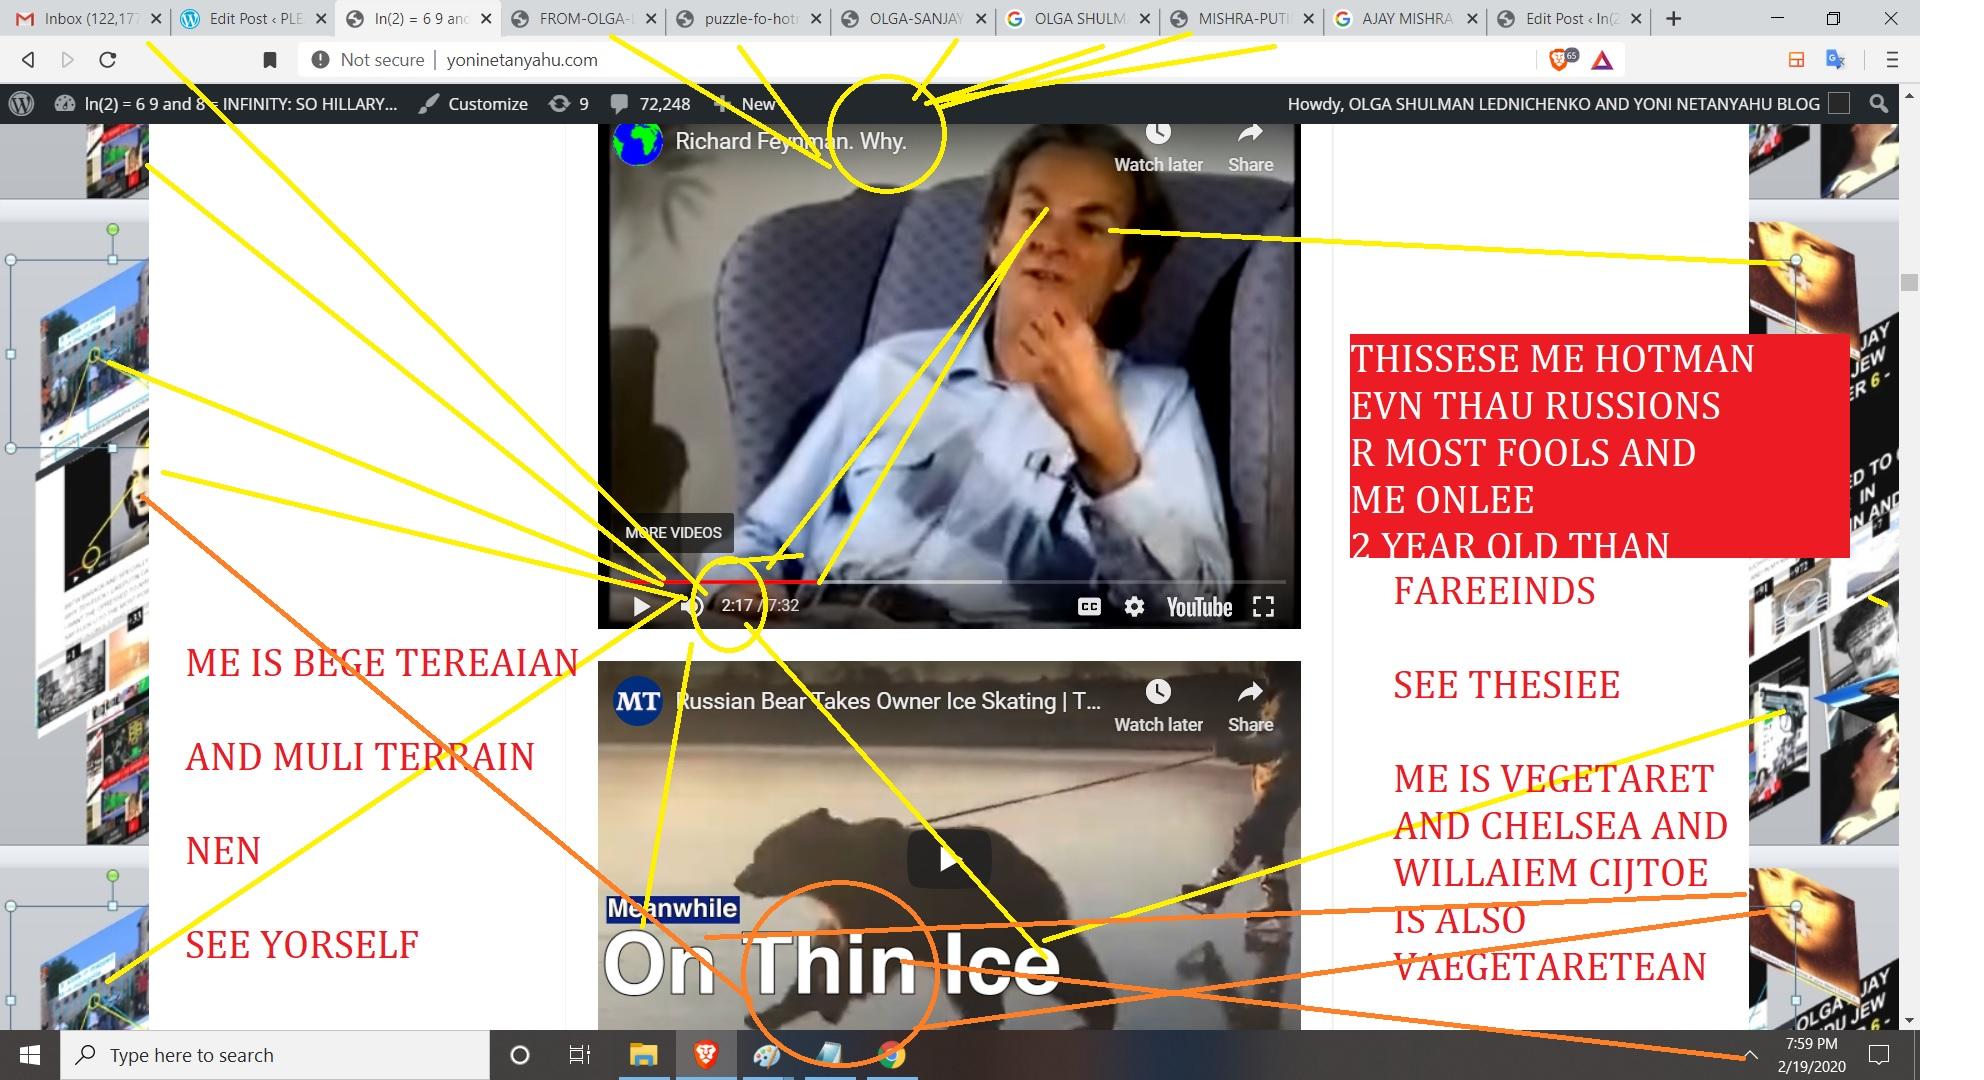 SHULMAN FEYNMAN ICE SKATINGA DN MAGNET DIGARAMS MAGMENTS MENS N AND S AND N N AND NS AND SN AND NS AND SS AND